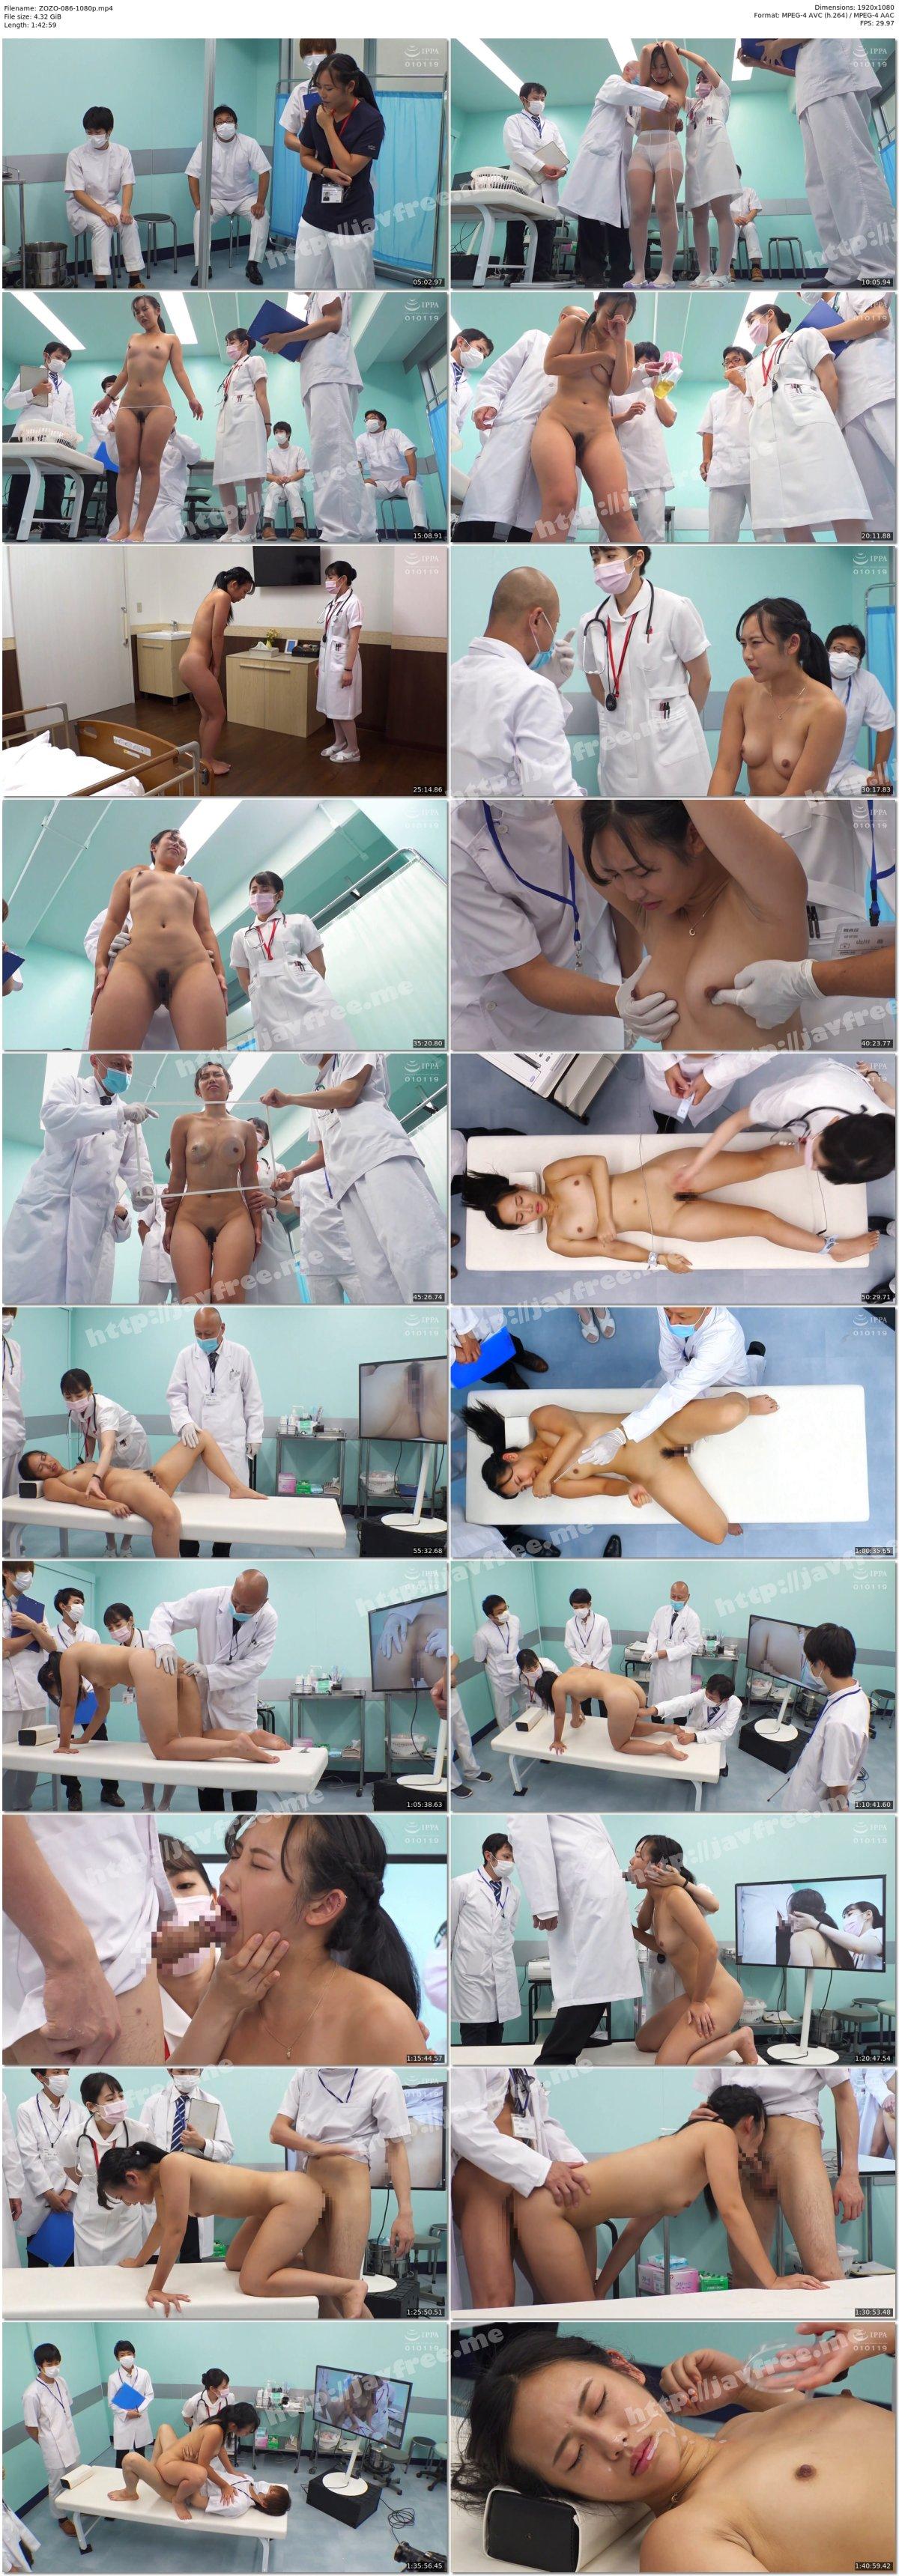 [HD][ZOZO-086] 羞恥!新卒看護師着任前健康診断~朝陽えま編~ - image ZOZO-086-1080p on https://javfree.me